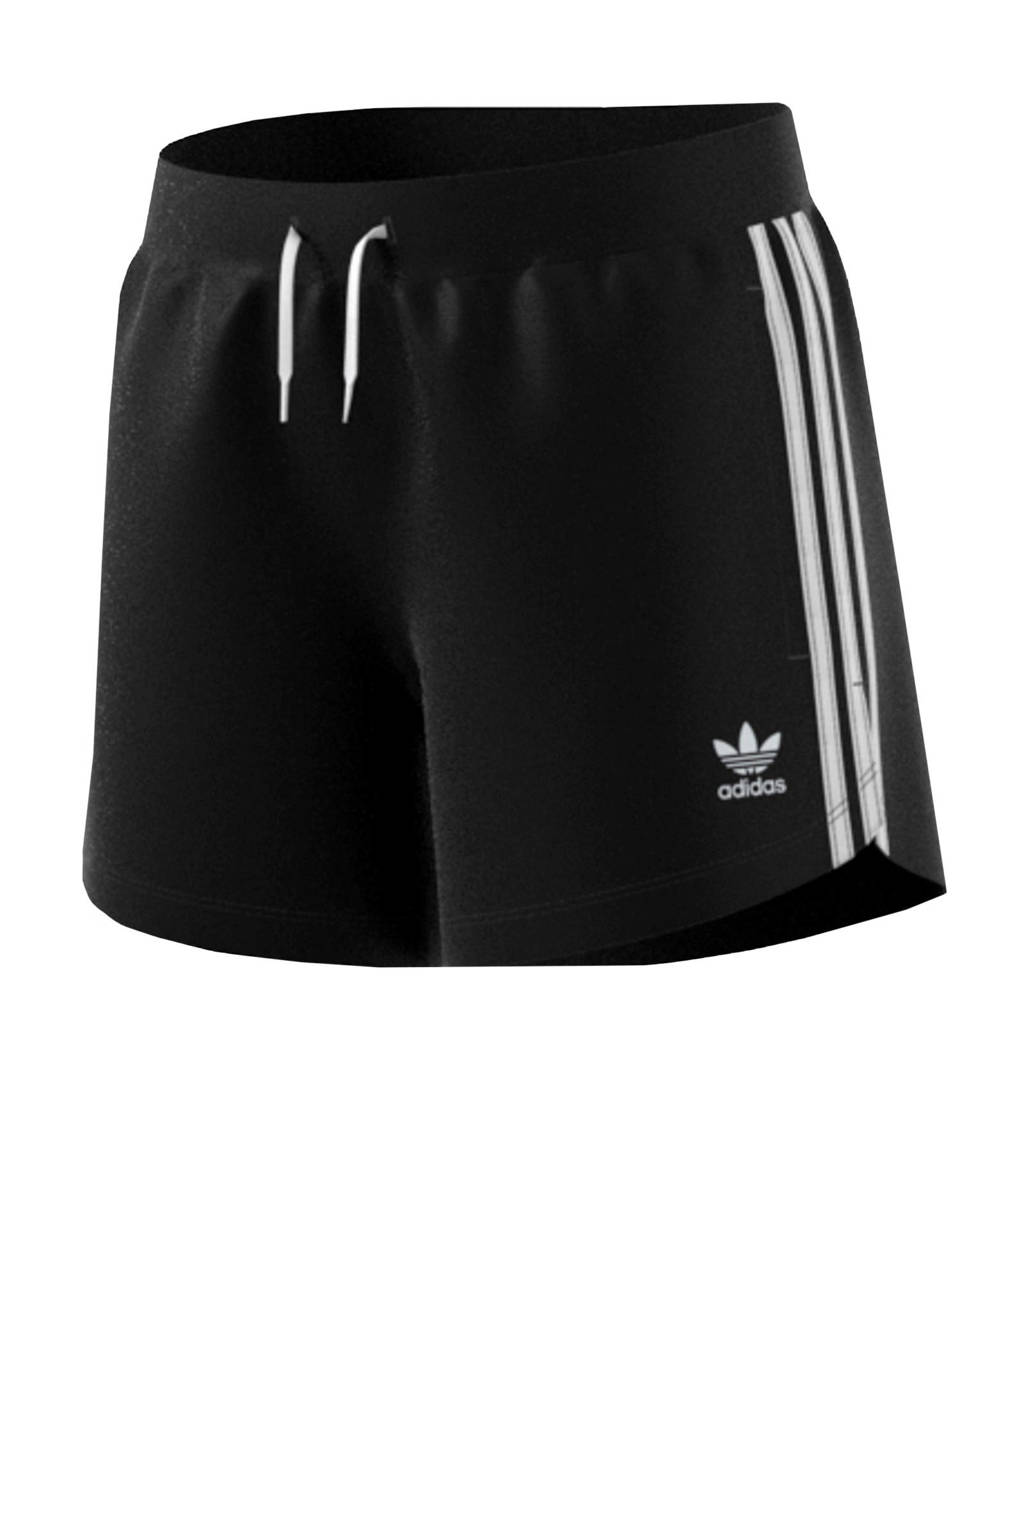 adidas originals sweatshort zwart, Zwart